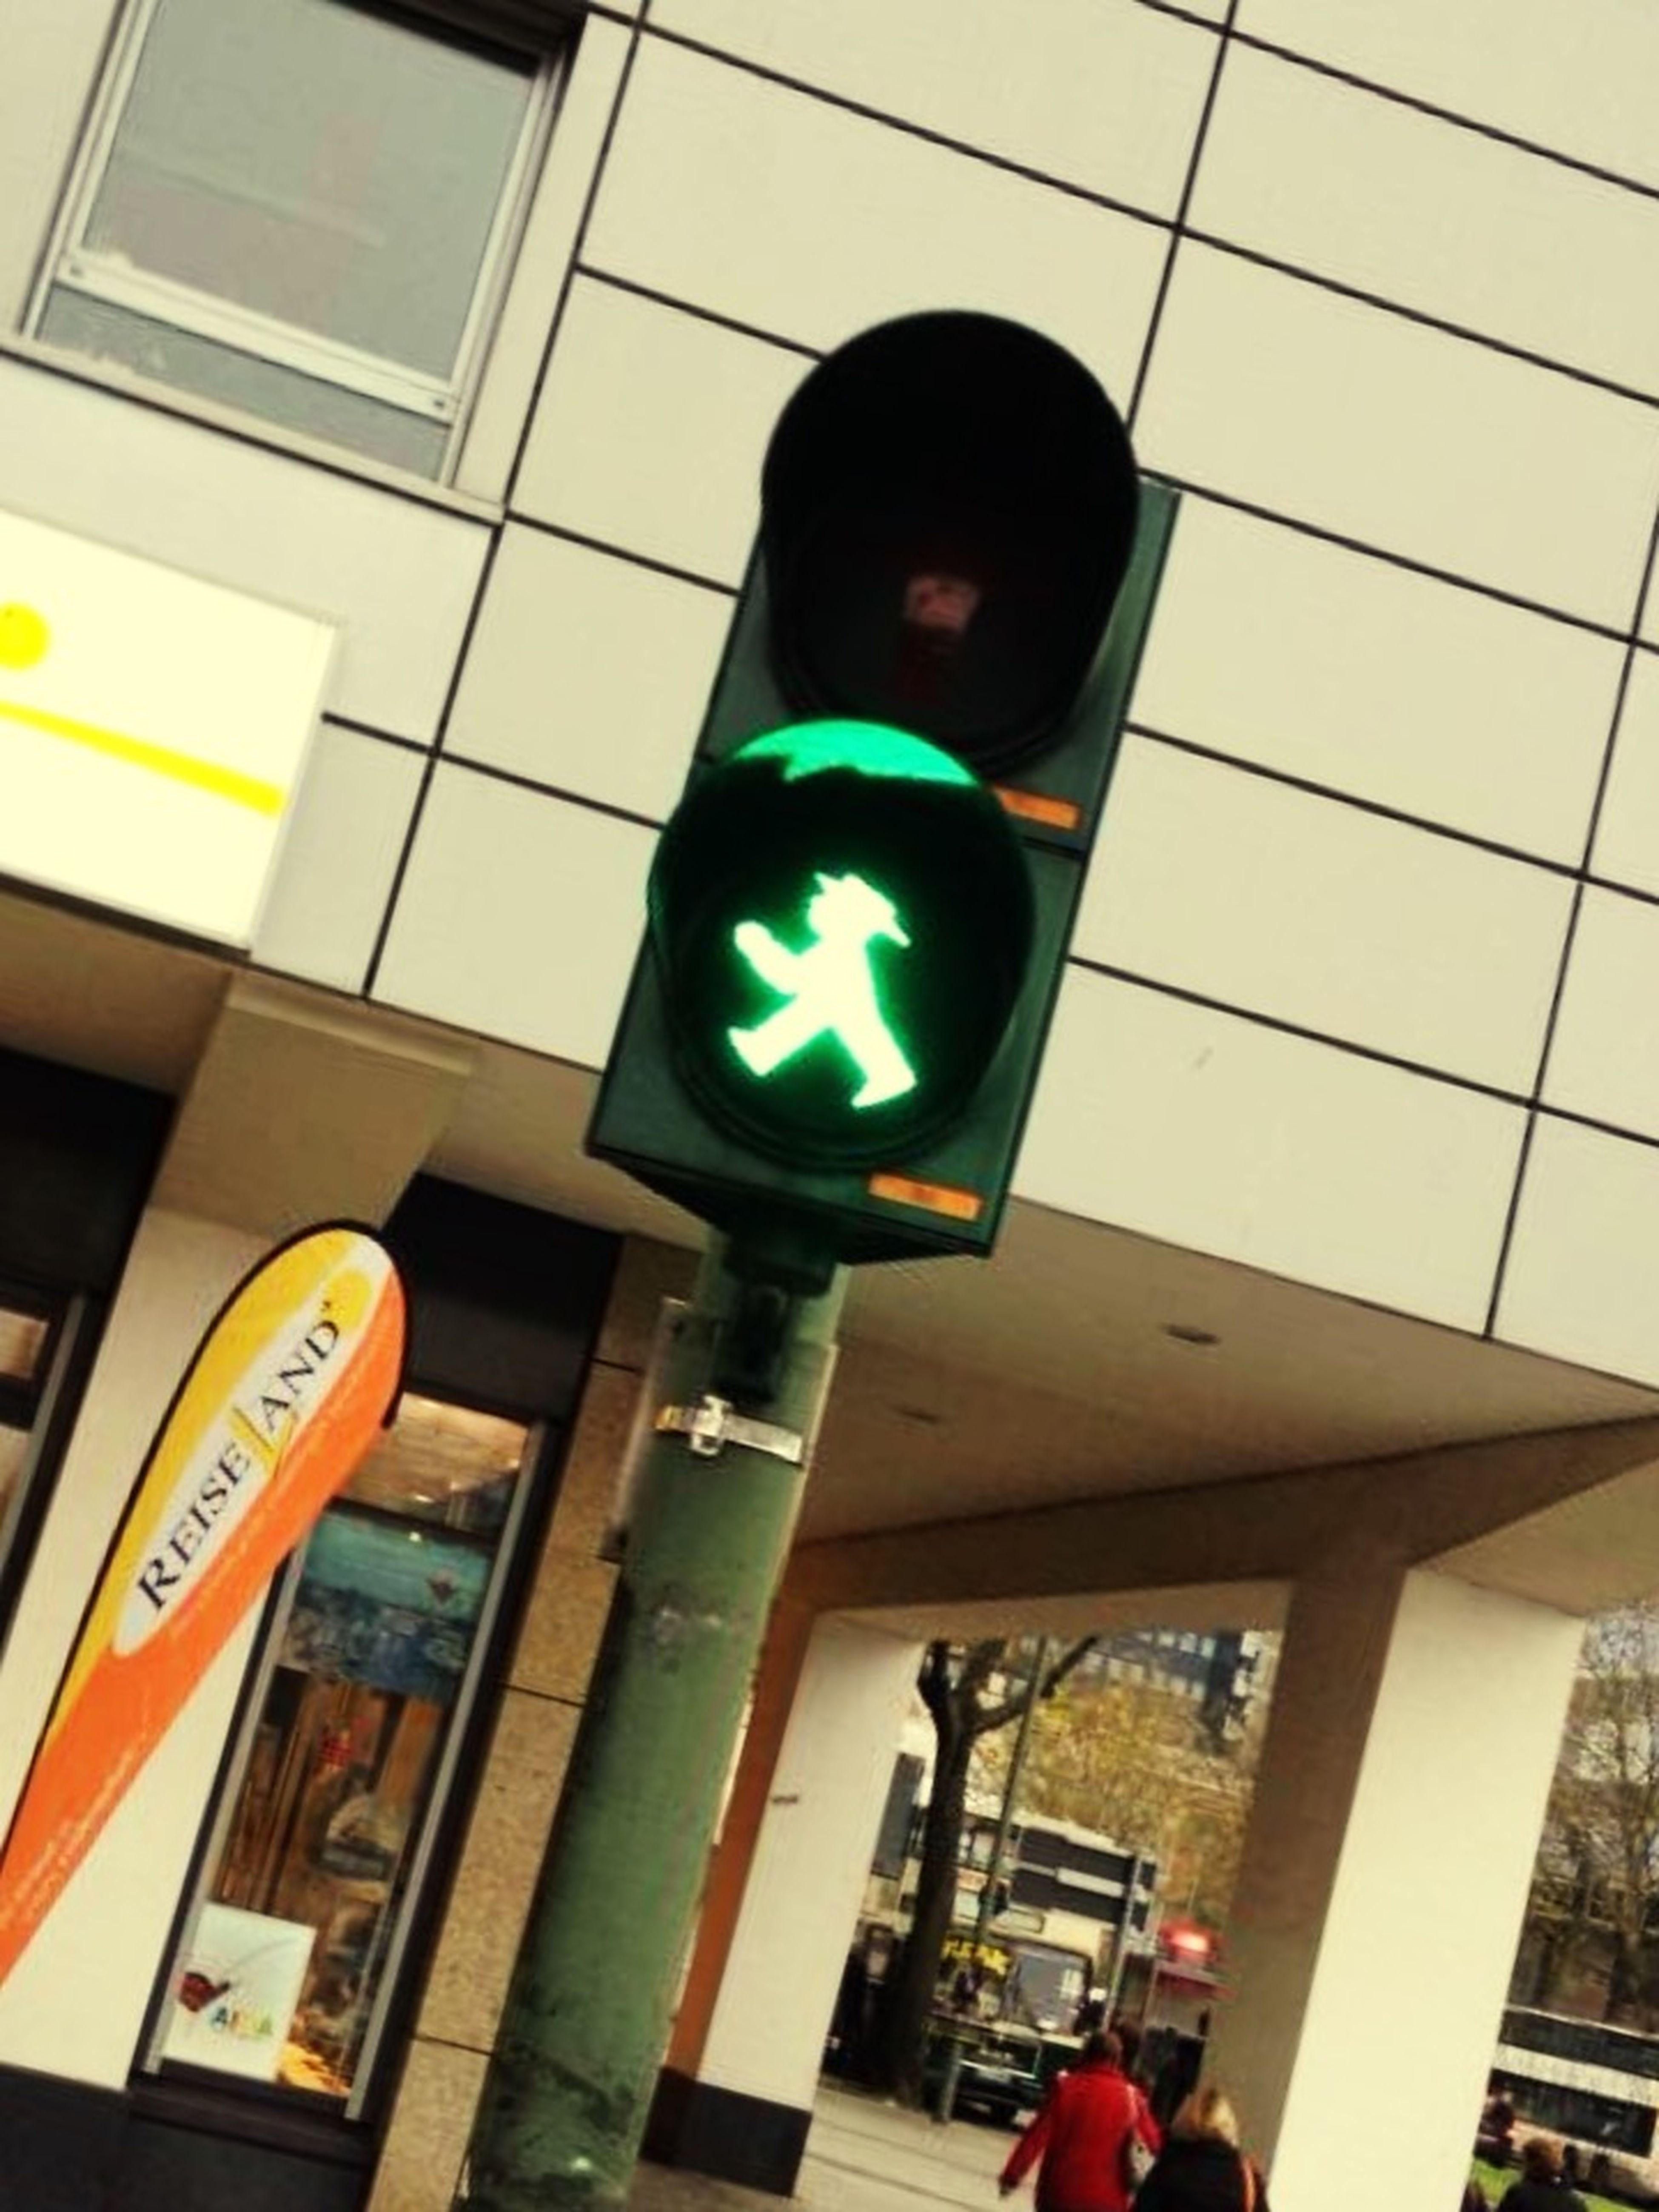 Ampelmännchen East Berlin Traveling Germany Berlin Me Around The World Walking On The Road Light Symbol